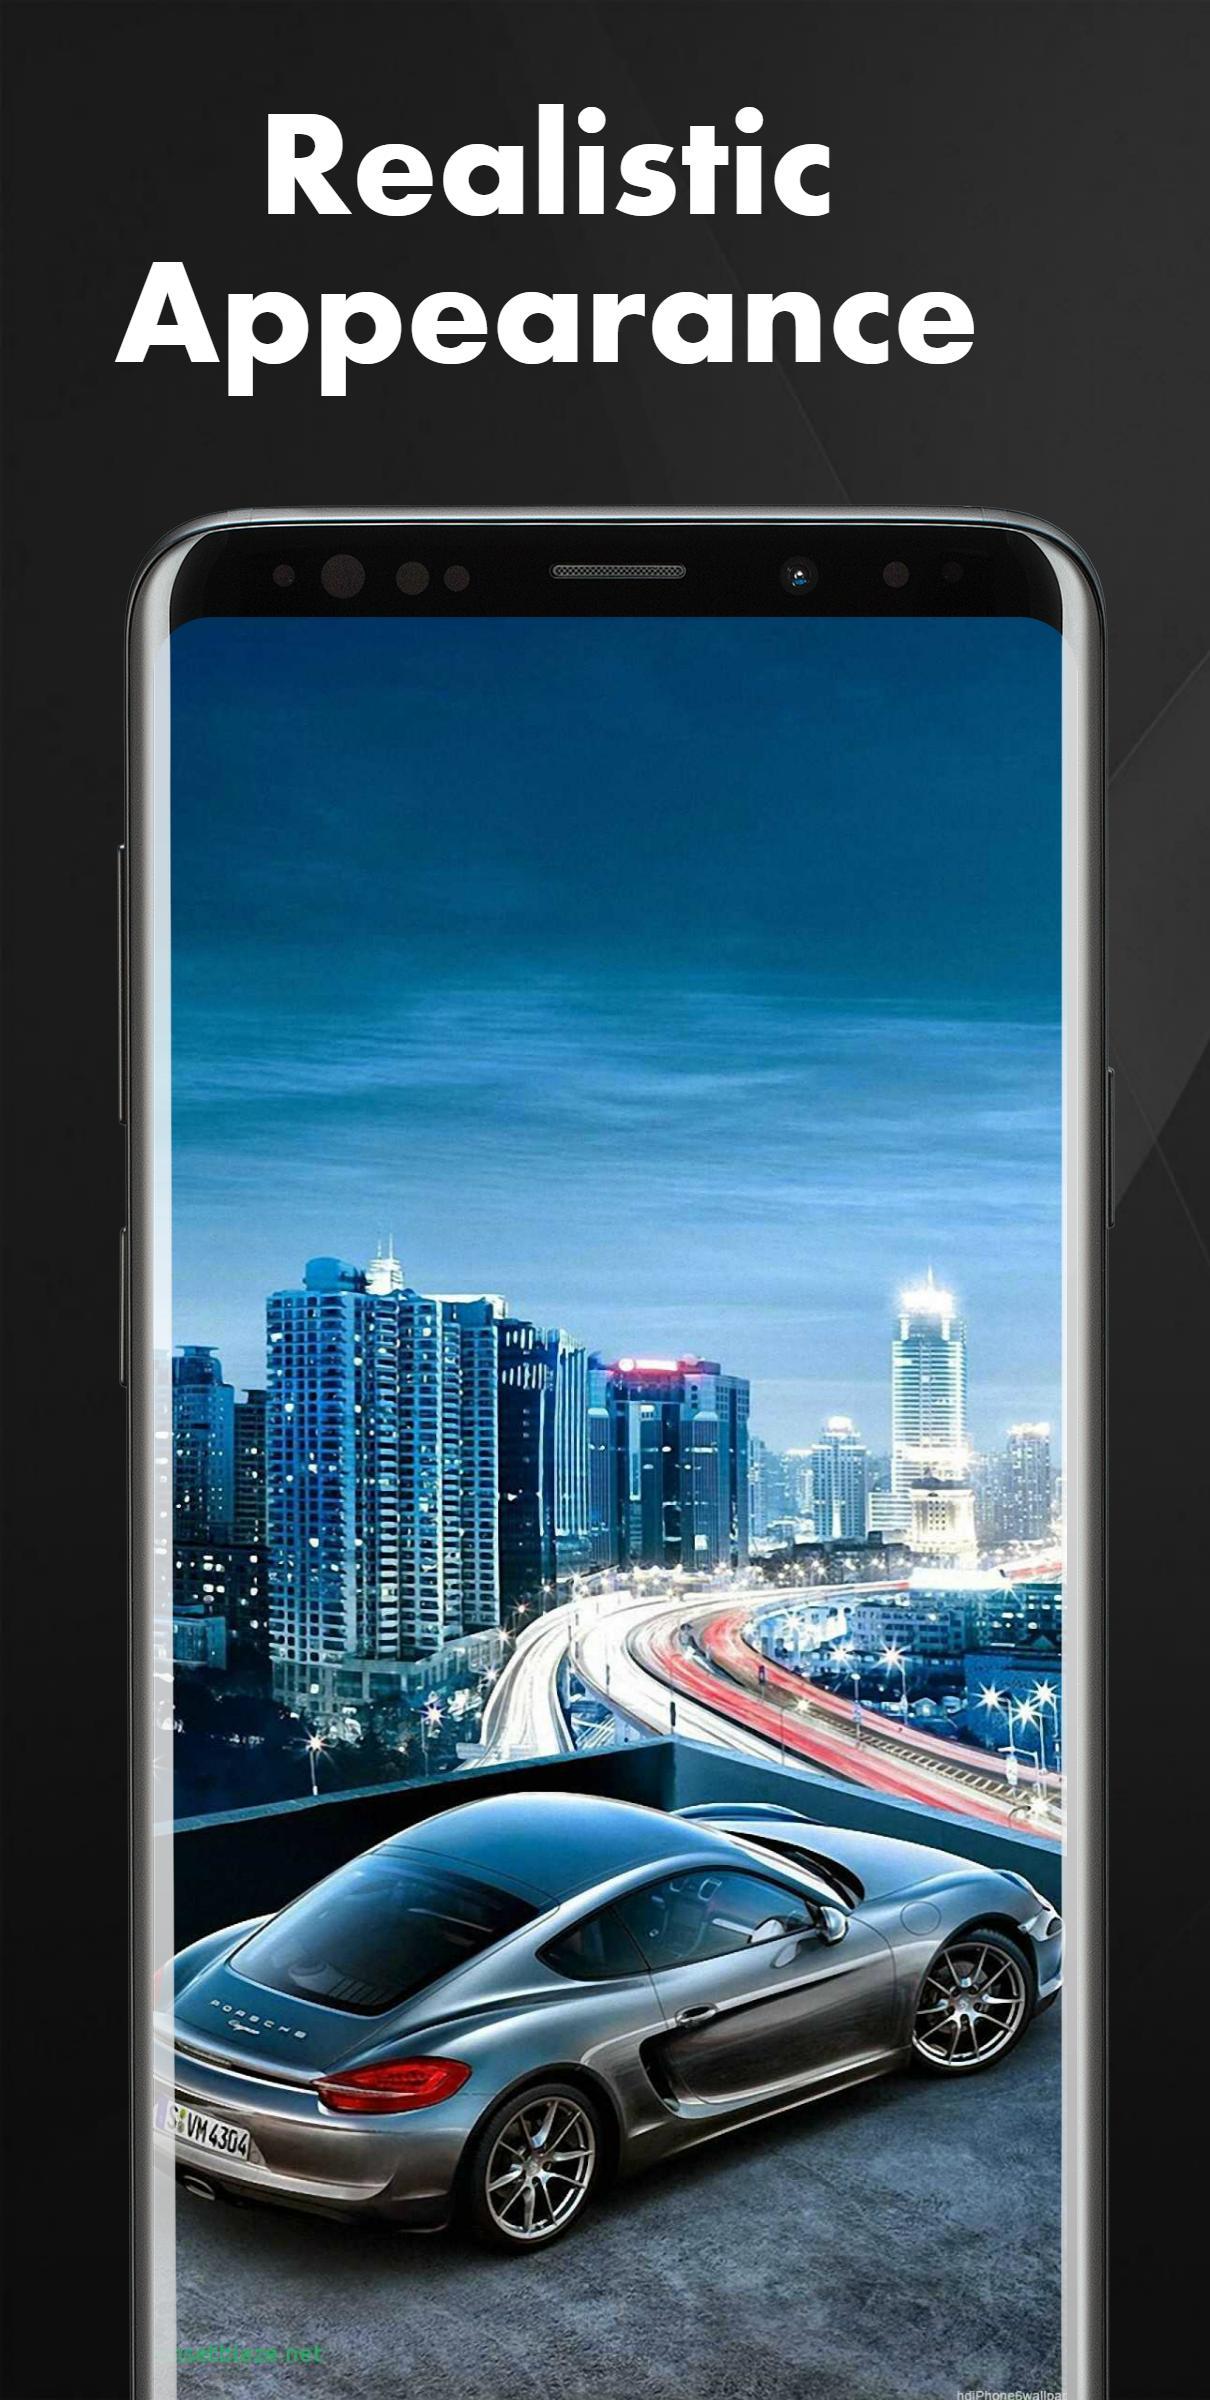 Hd Car Wallpapers 4k 1080p Car Wallpapers For